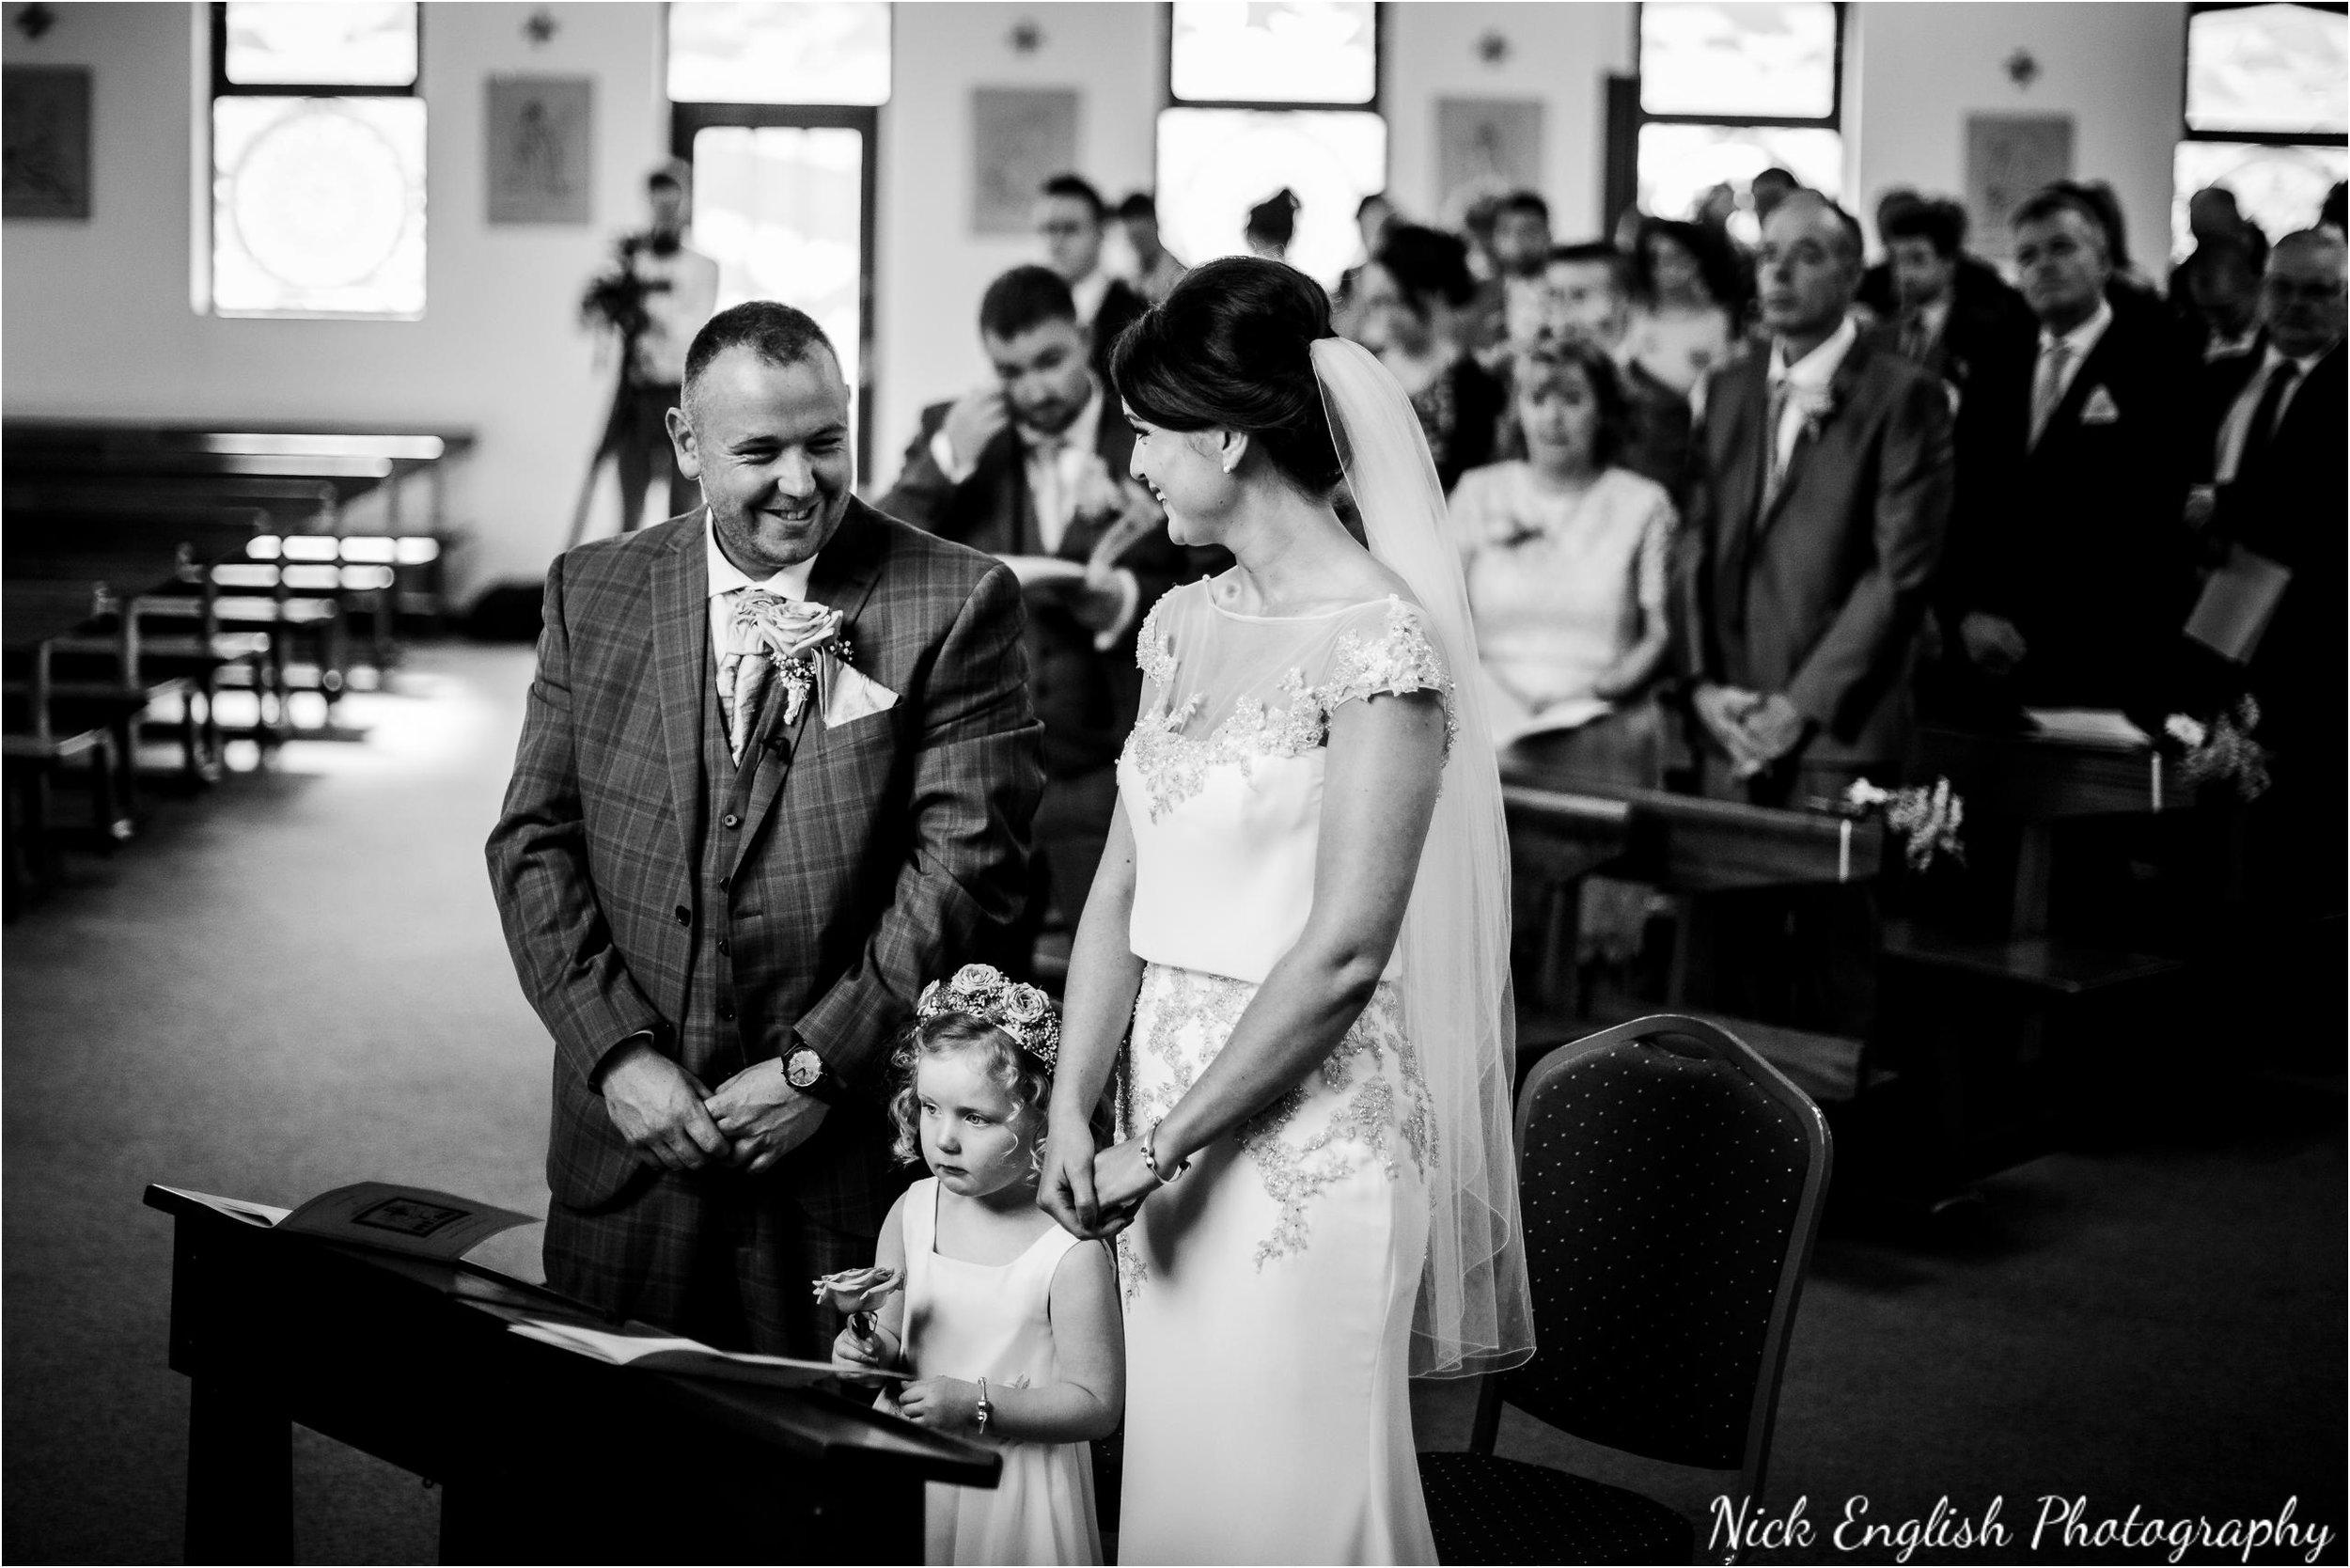 Stacey-Ash-Wedding-Photographs-Stanley-House-Preston-Lancashire-48.jpg